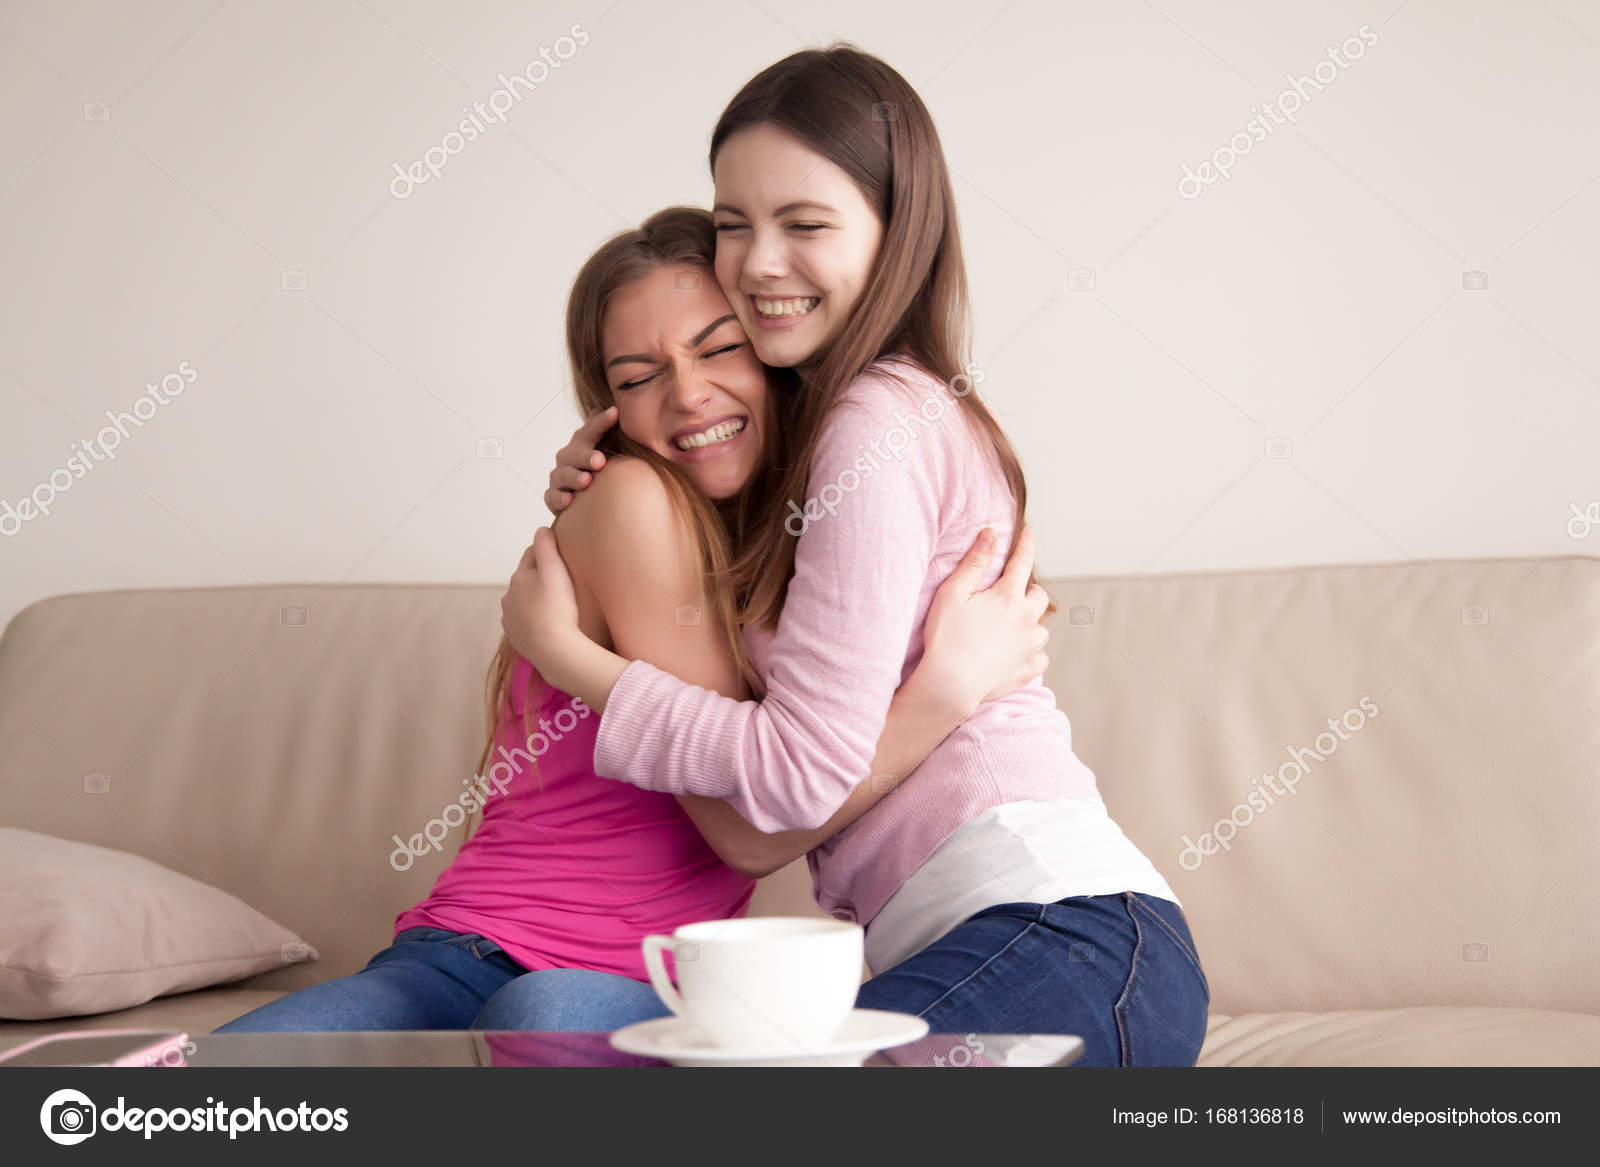 Dating vriendinnen zus hook up op cruises zeeën